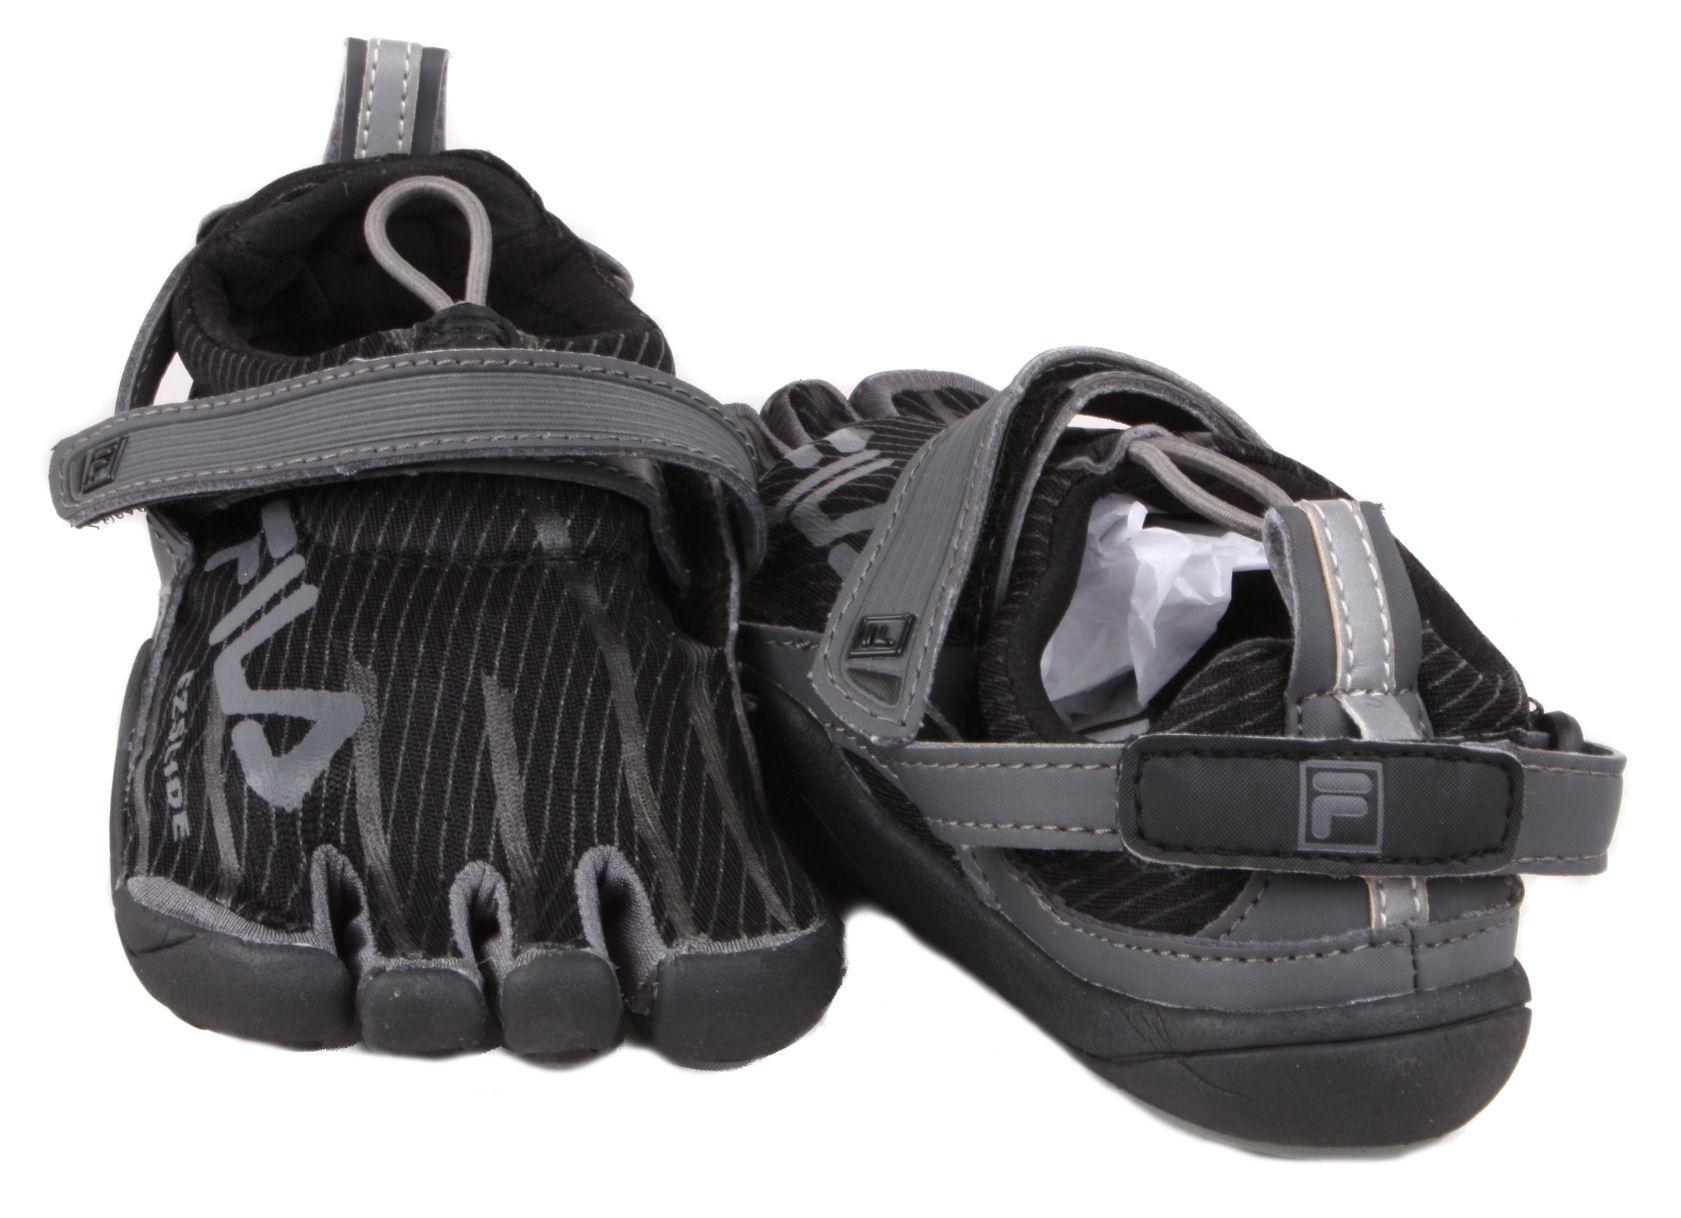 Women's Fila^ Skele-toes EZ Slide Shoes, Gray / Fuschia - 612928